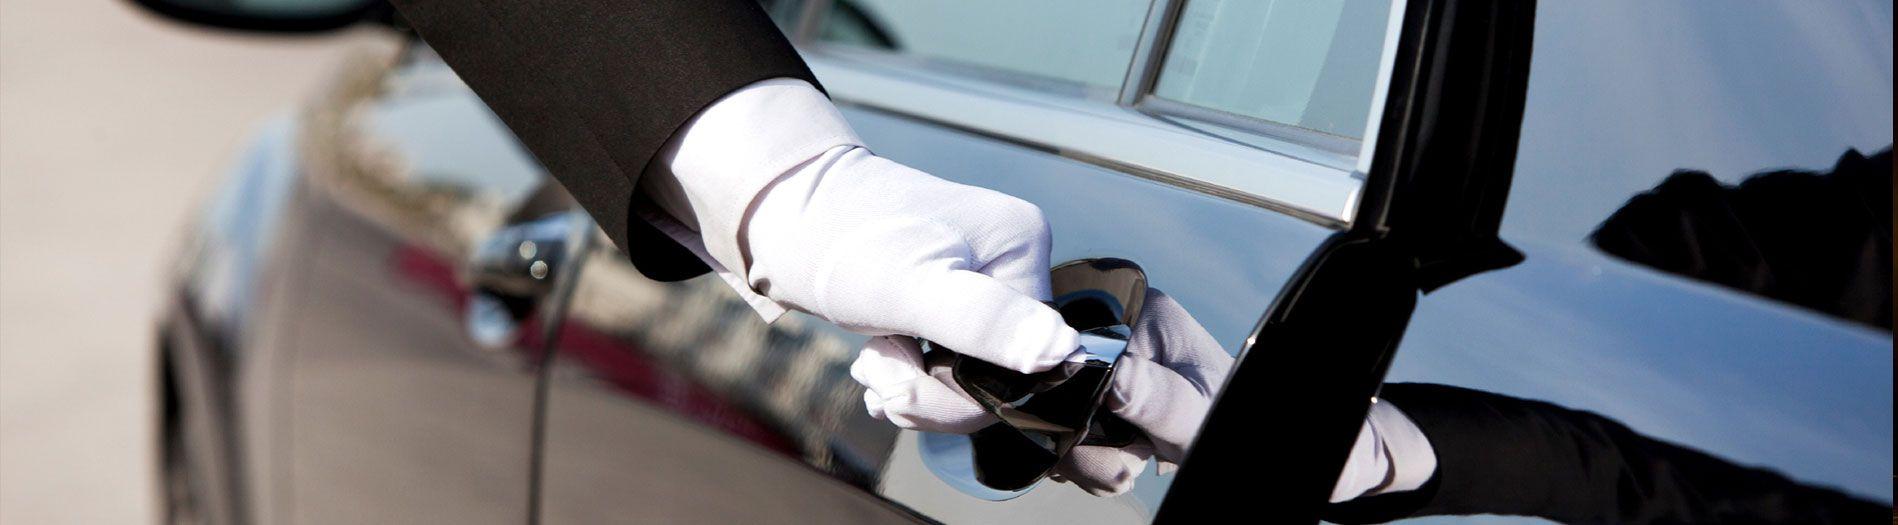 Book Luxury Chauffeur Driven Cars Ktc India Pvt Ltd Chauffeur Service Car Rental Service Limo Rental